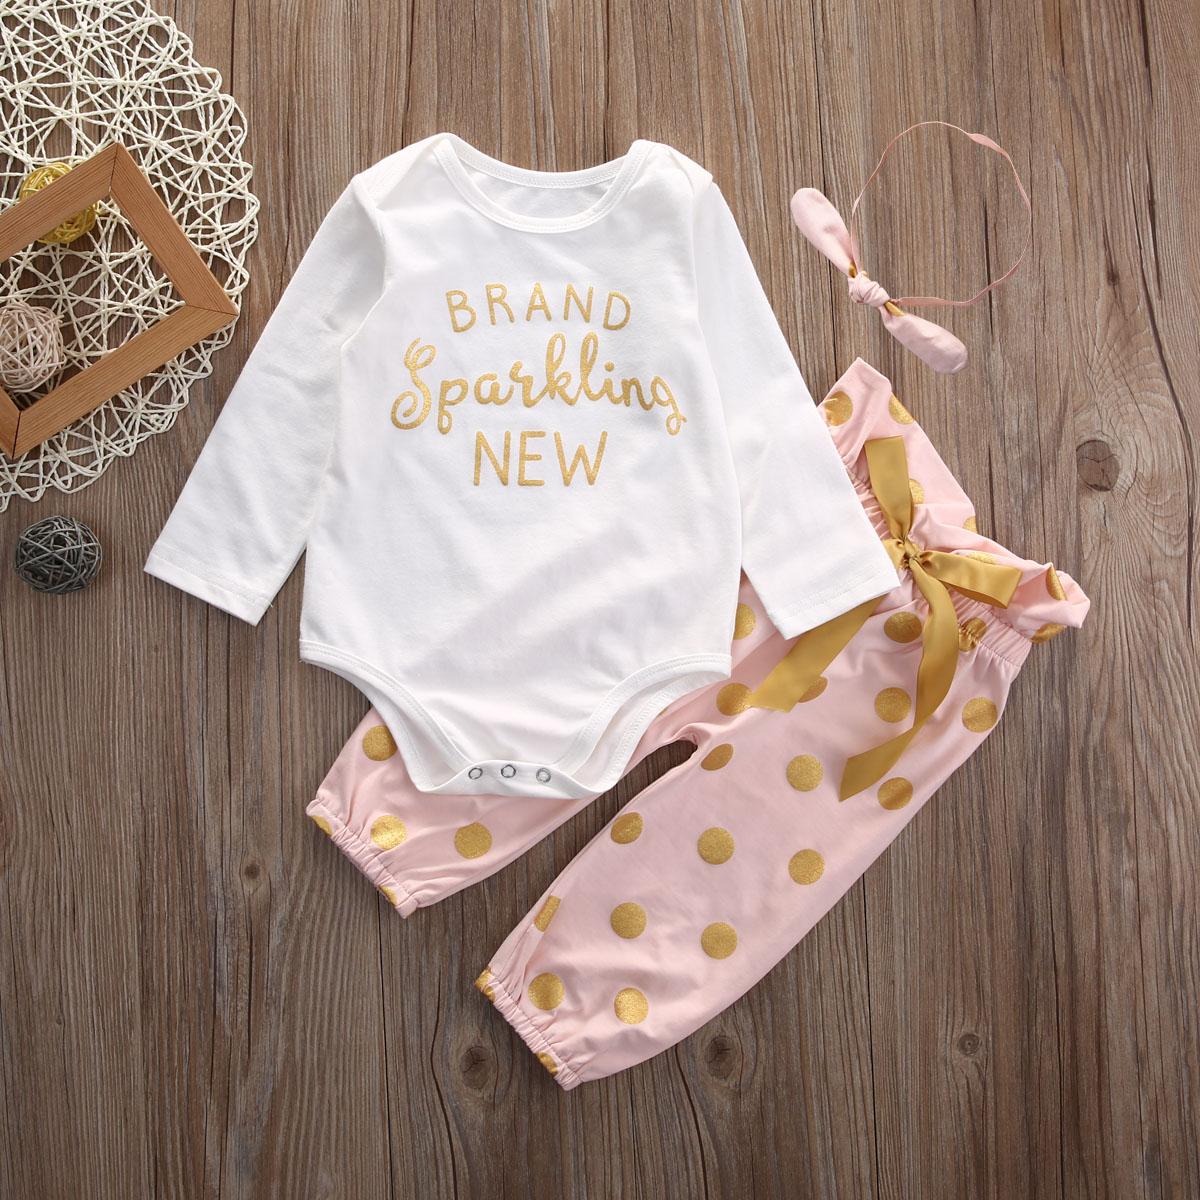 3pcs baby set !! toddle autumn baby girl autumn long sleeve letter baby bodysuit+long polka dot pants+headband baby clothes set